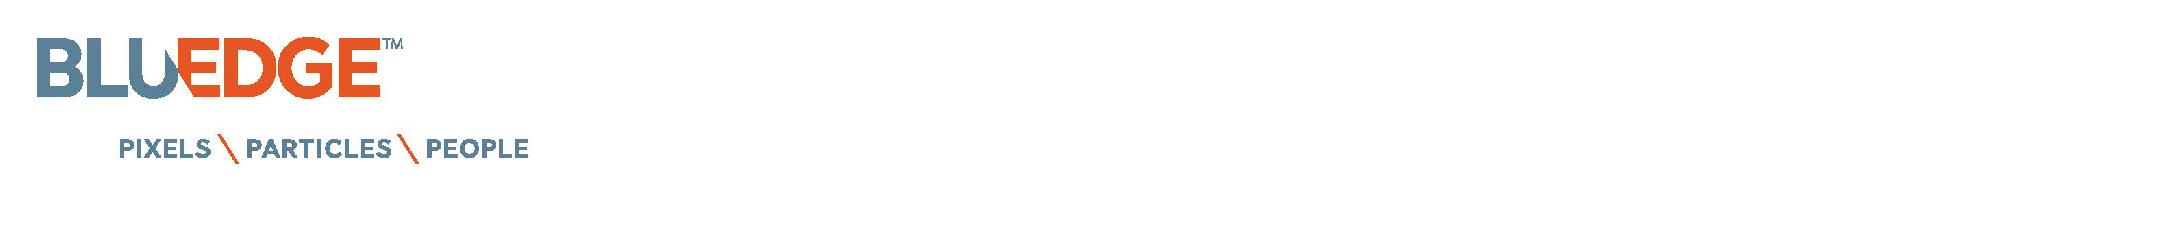 bluedge logo